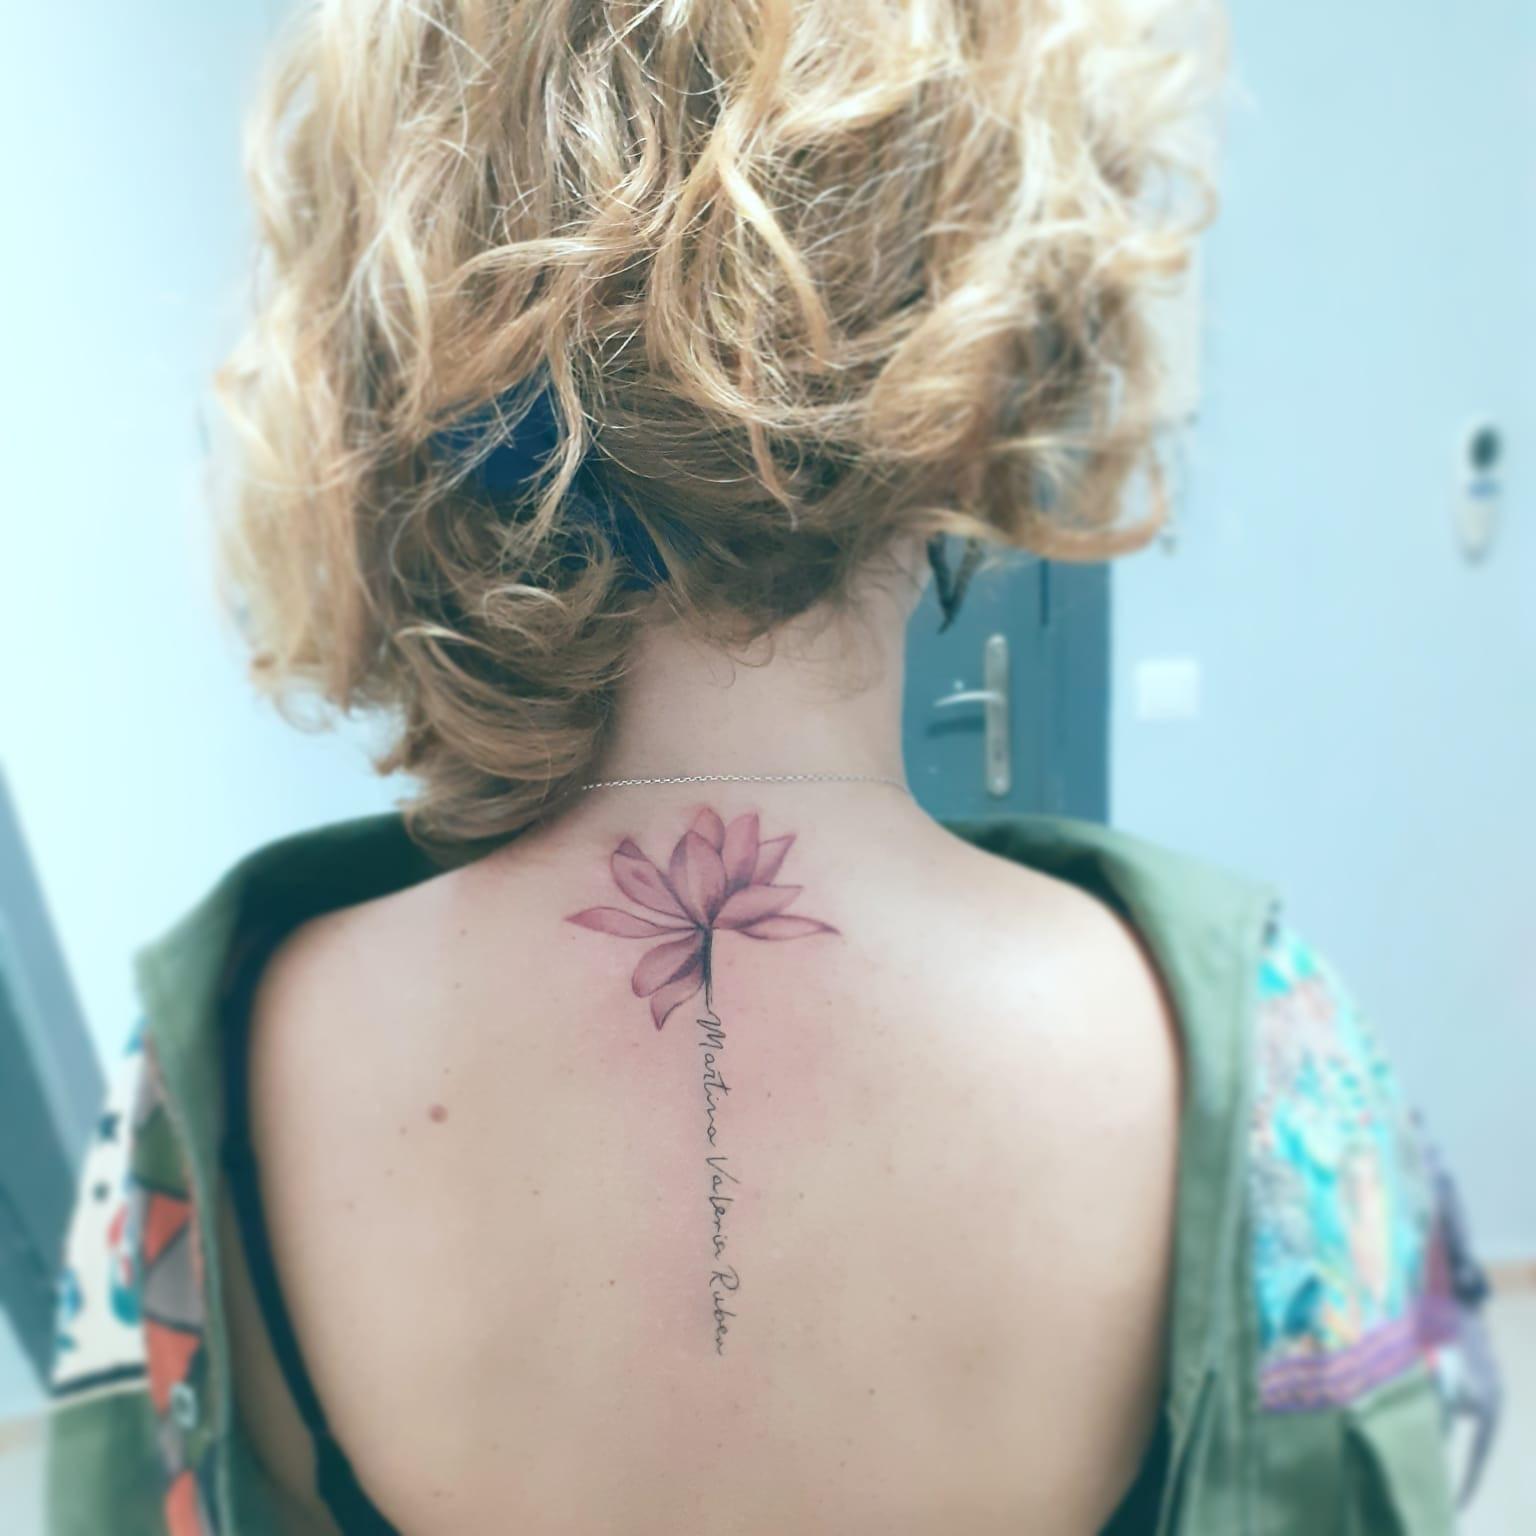 Tatuaje personalizado. (incluye seguro)